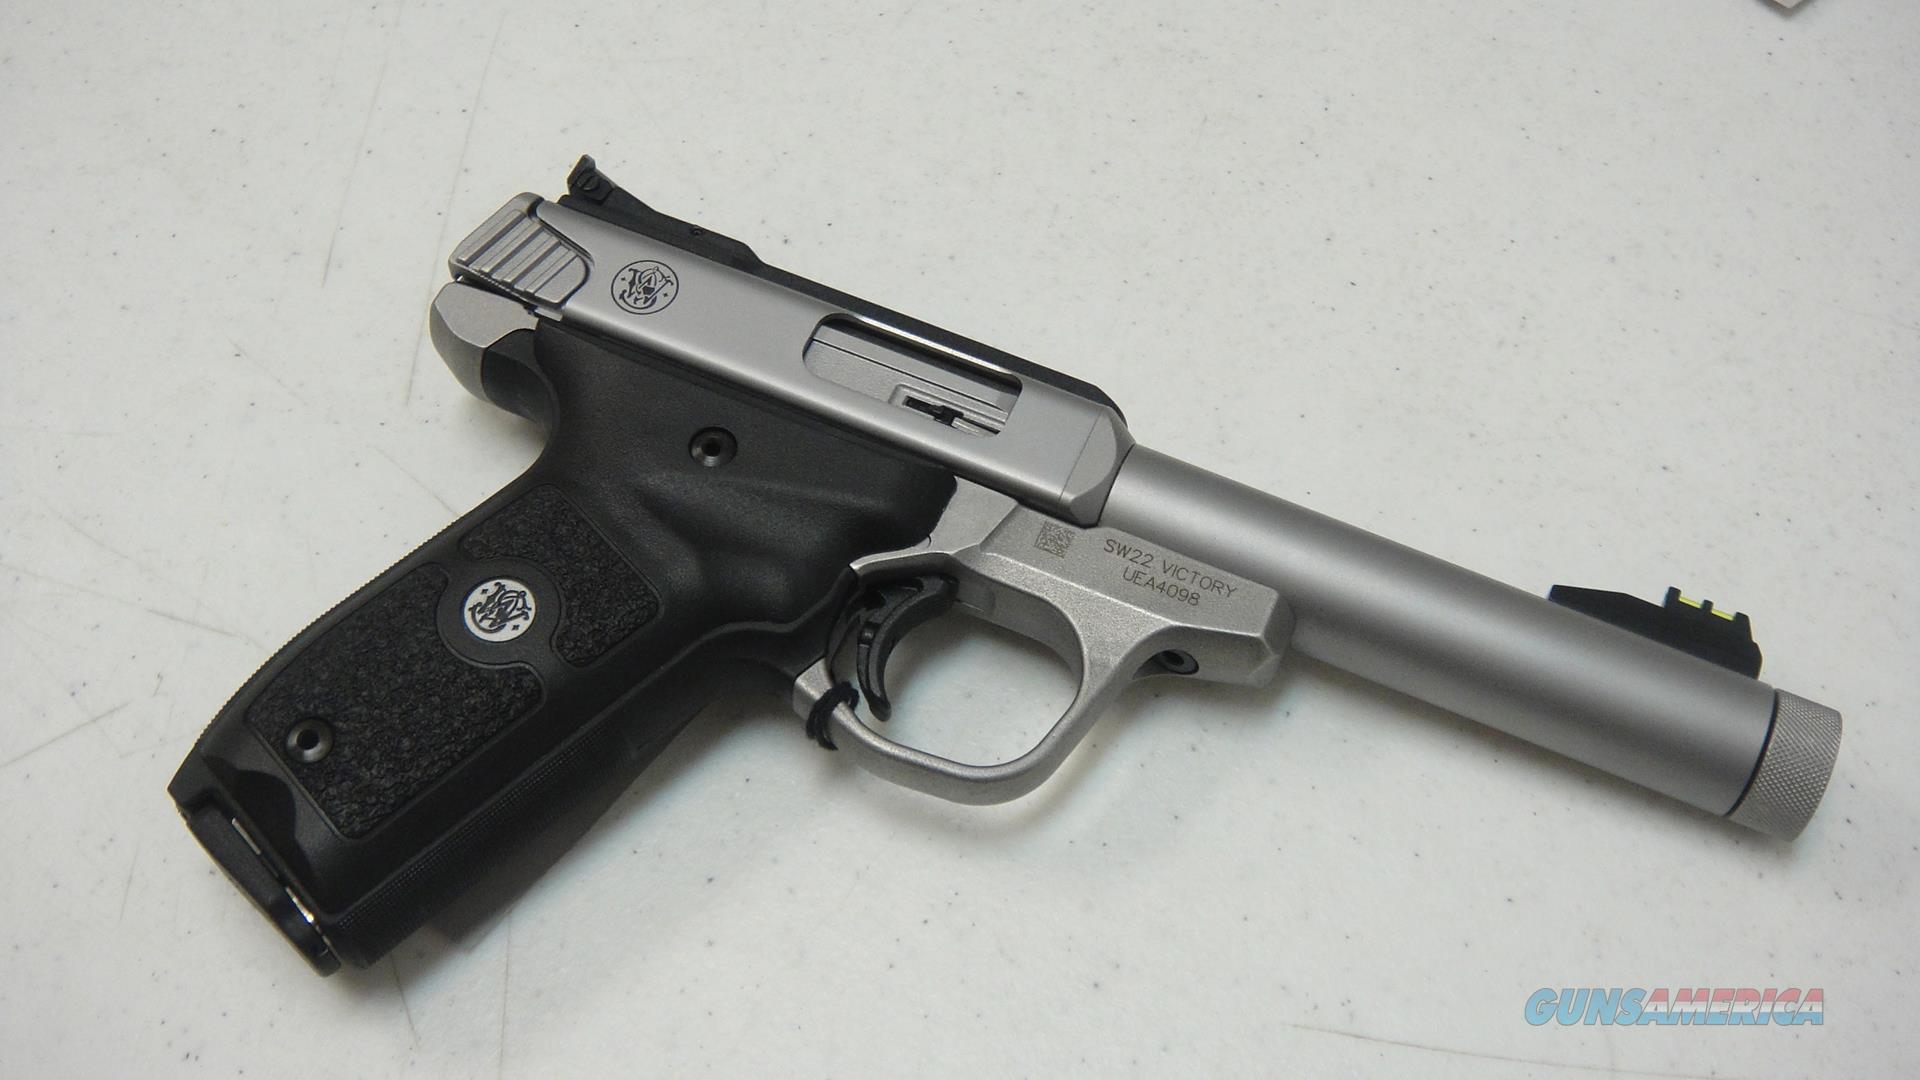 Smith+Wesson SW22 Victory  Guns > Pistols > Smith & Wesson Pistols - Autos > .22 Autos